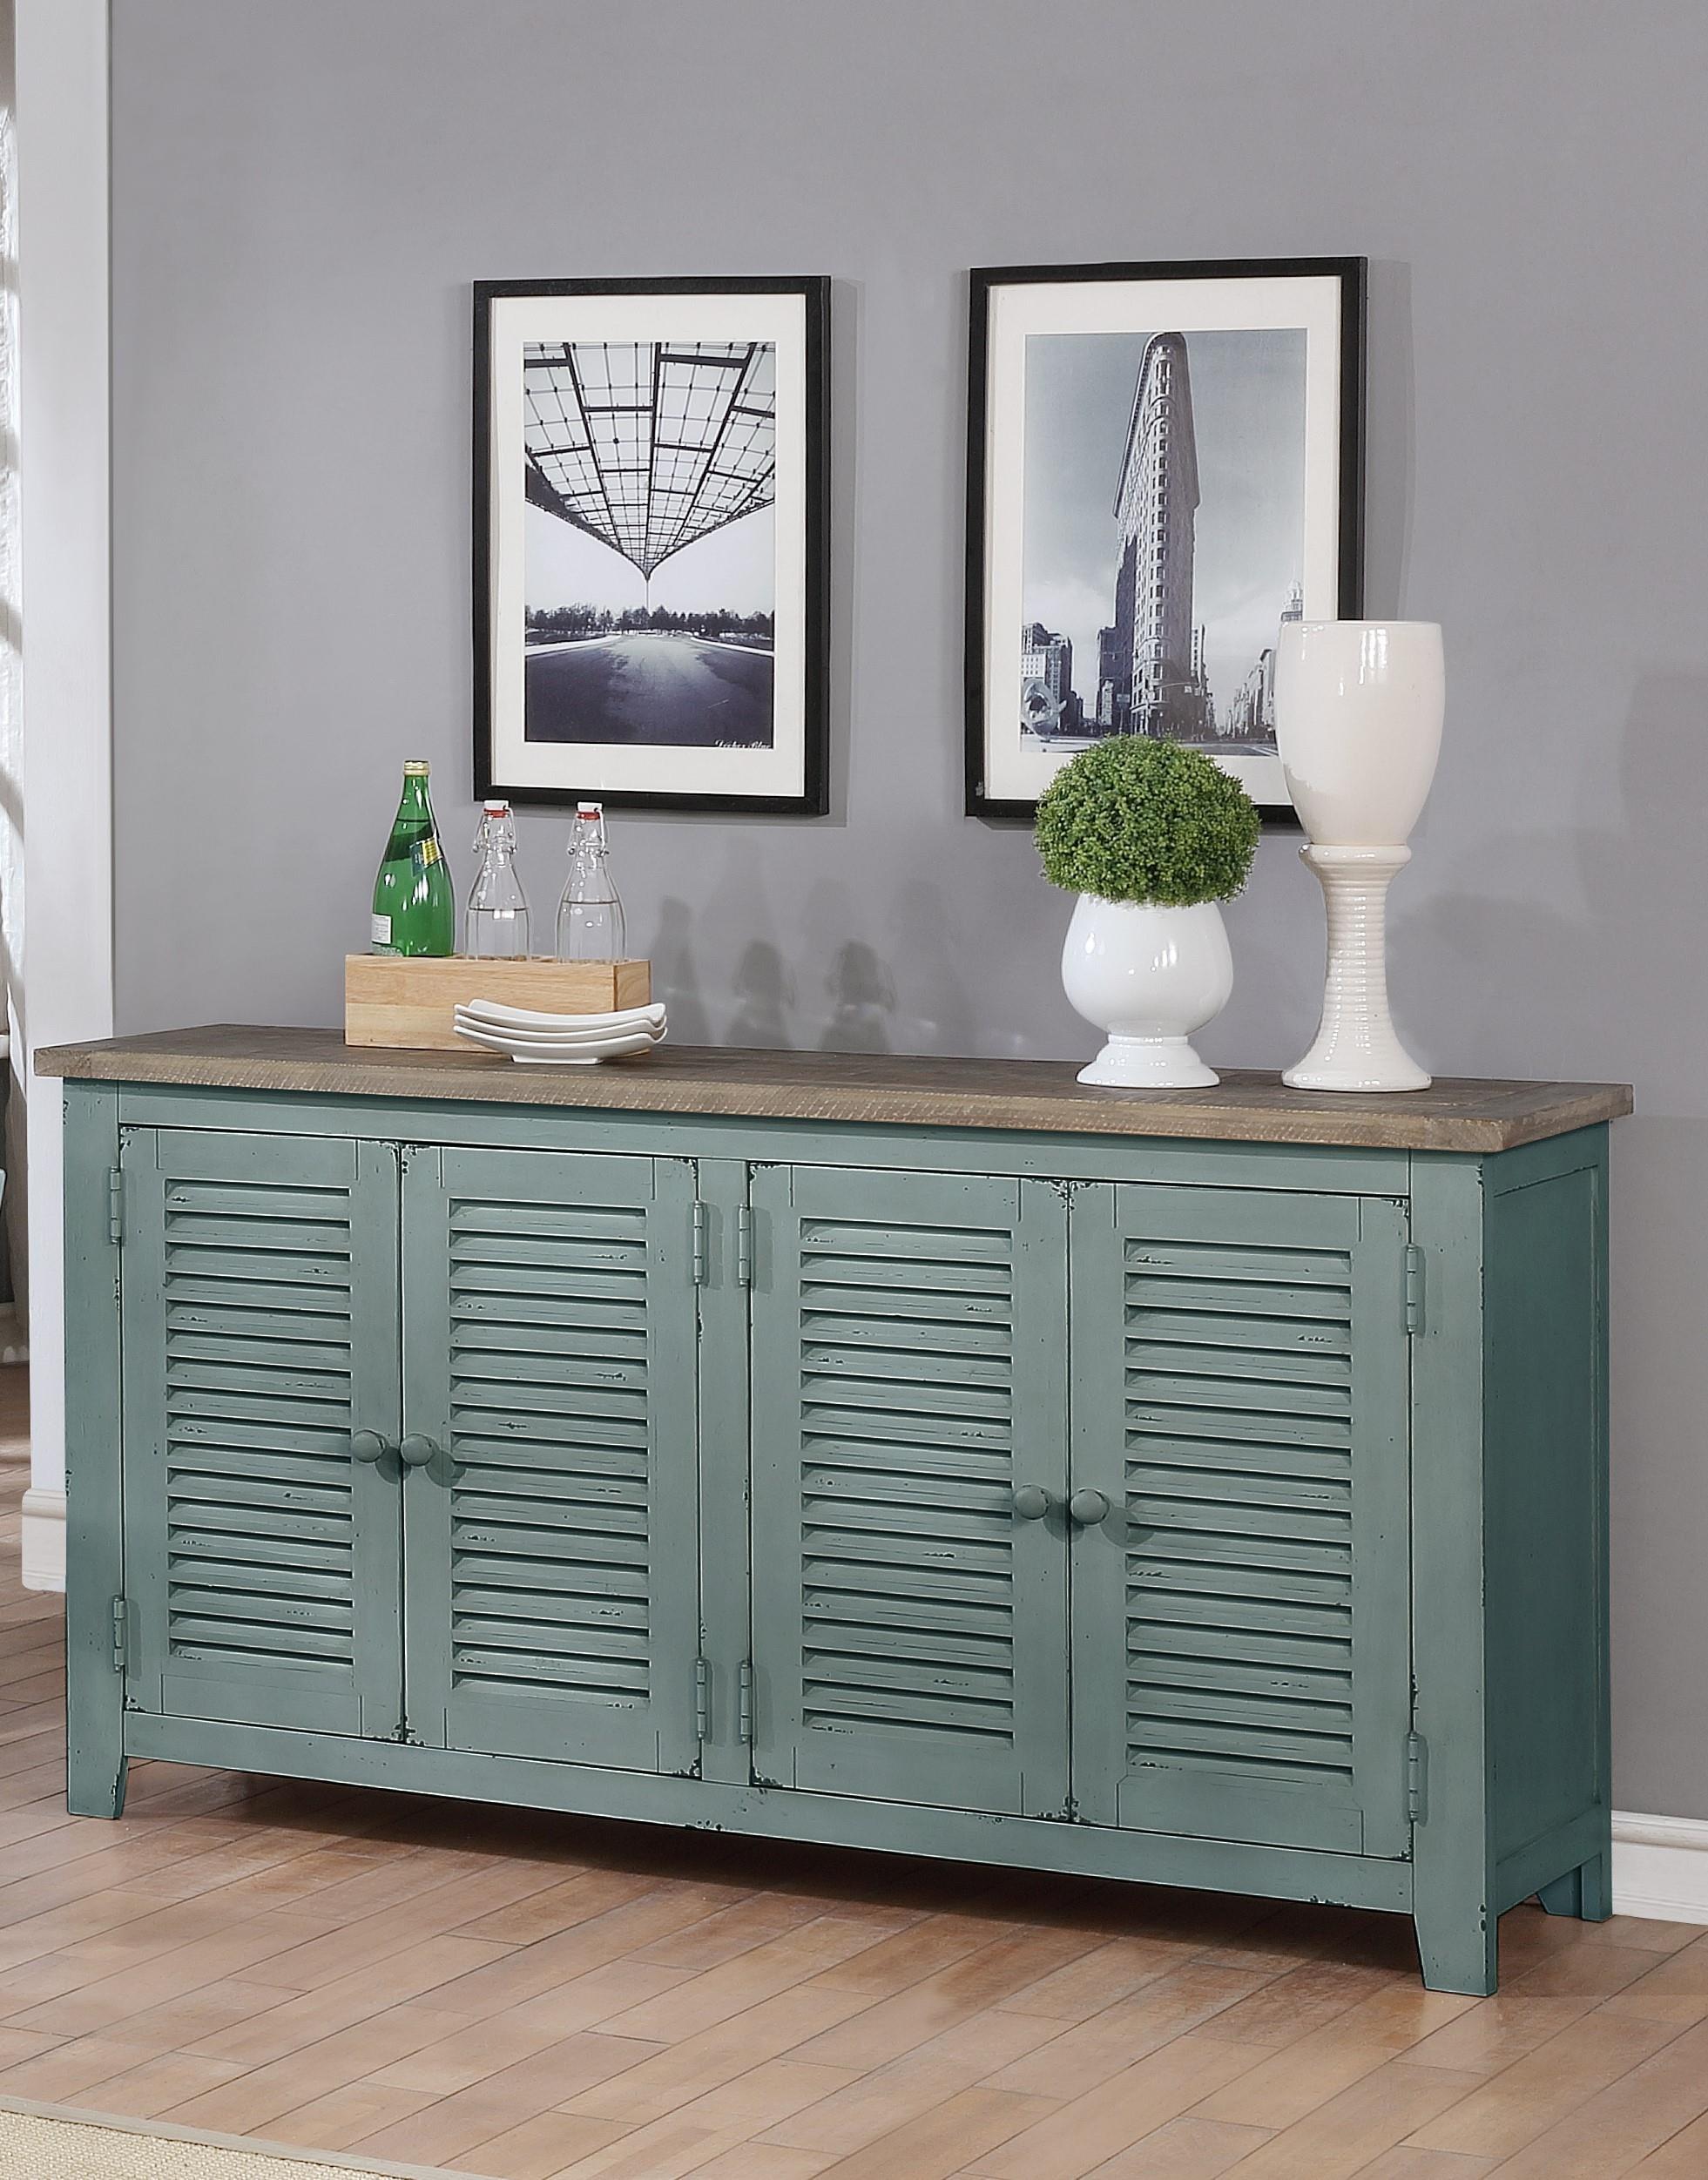 C1854D Blue/ Brown 4 Door Server by Lifestyle at Furniture Fair - North Carolina